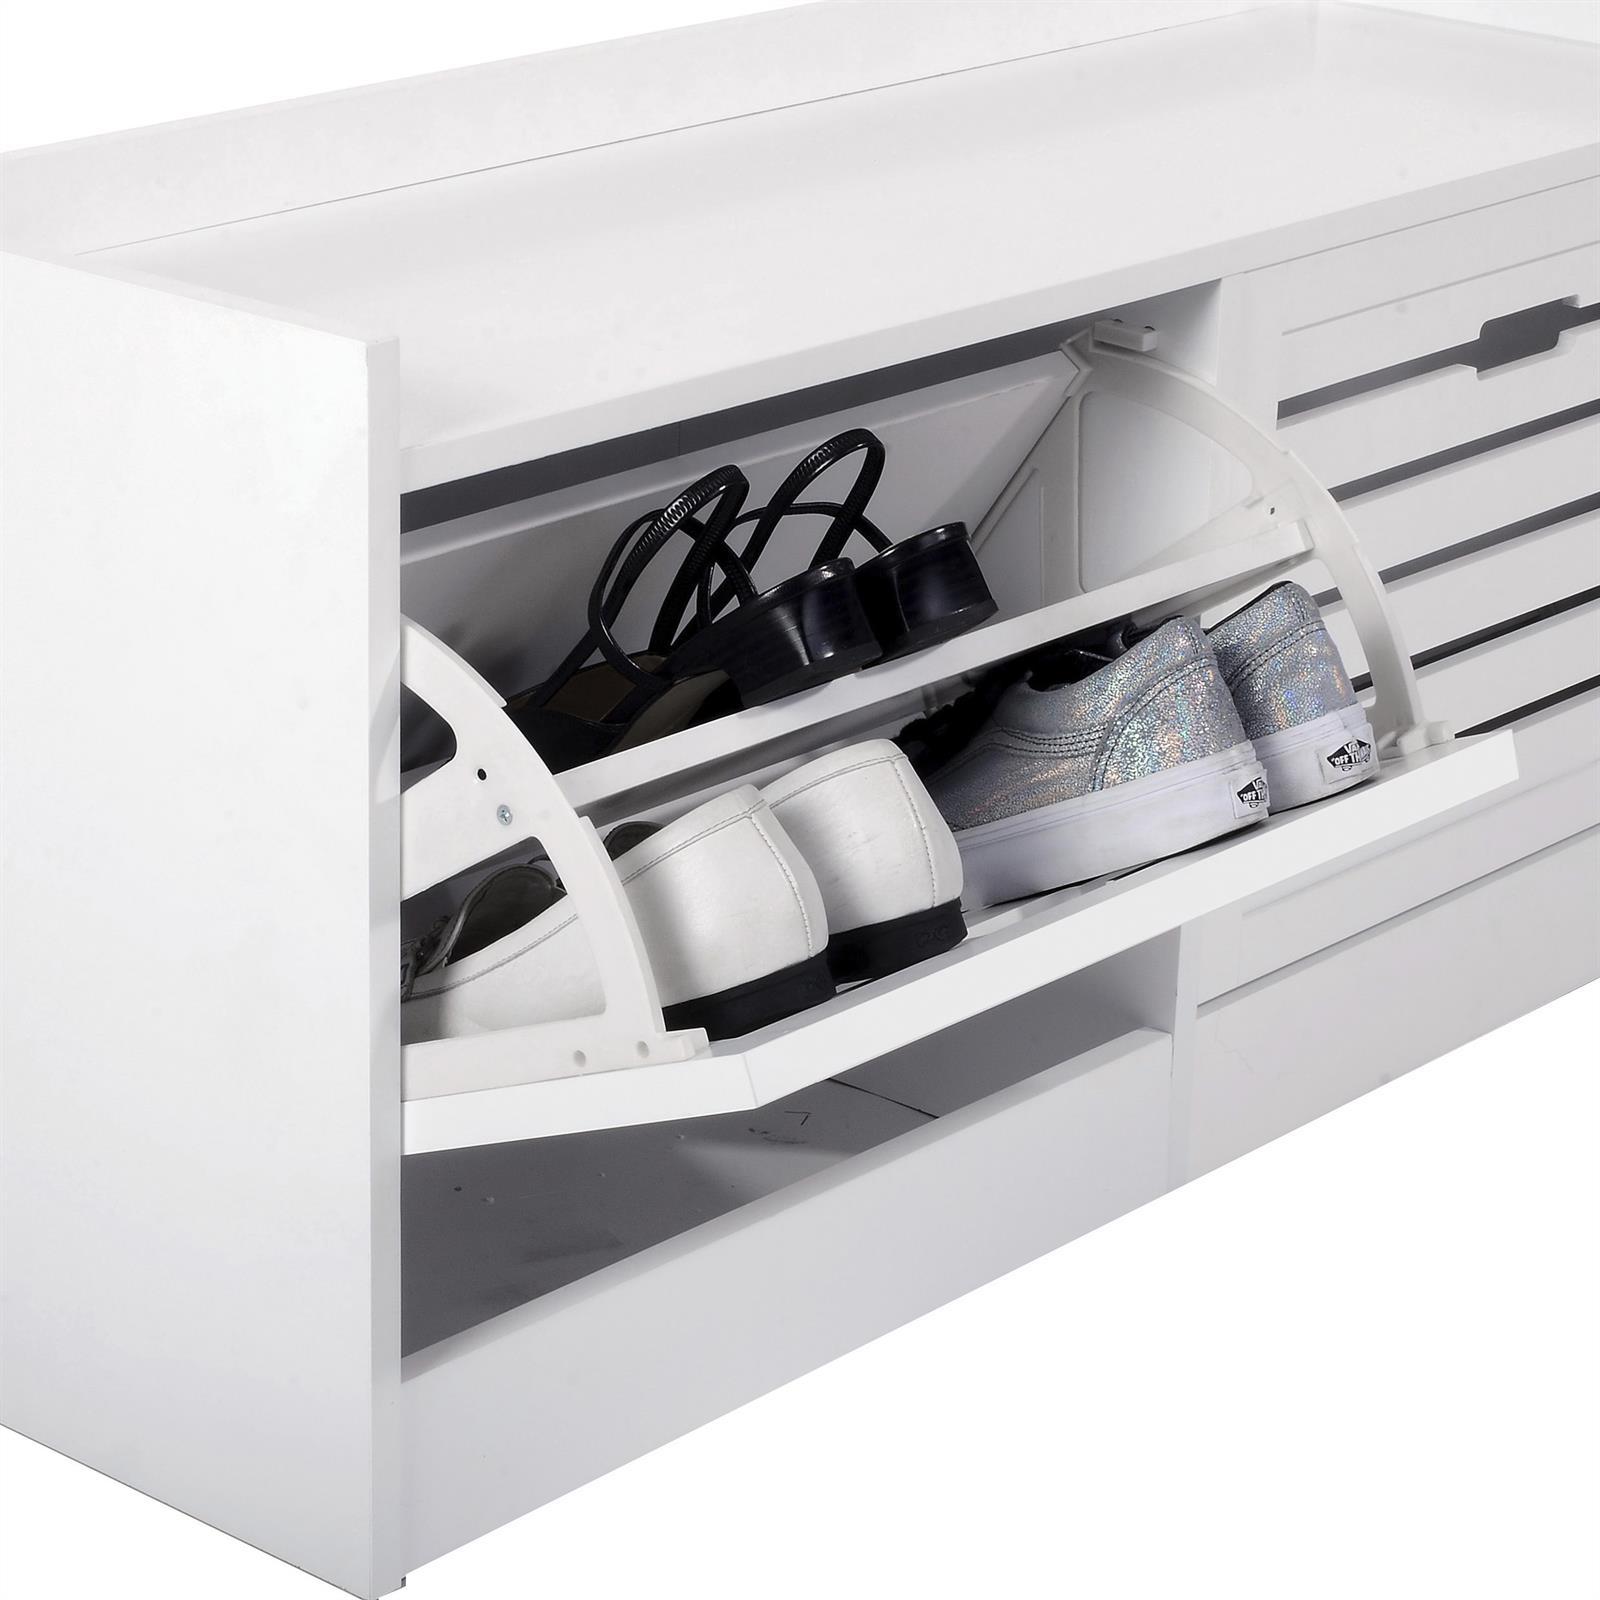 banc de rangement chaussures udine blanc 2 abattants mobil meubles. Black Bedroom Furniture Sets. Home Design Ideas